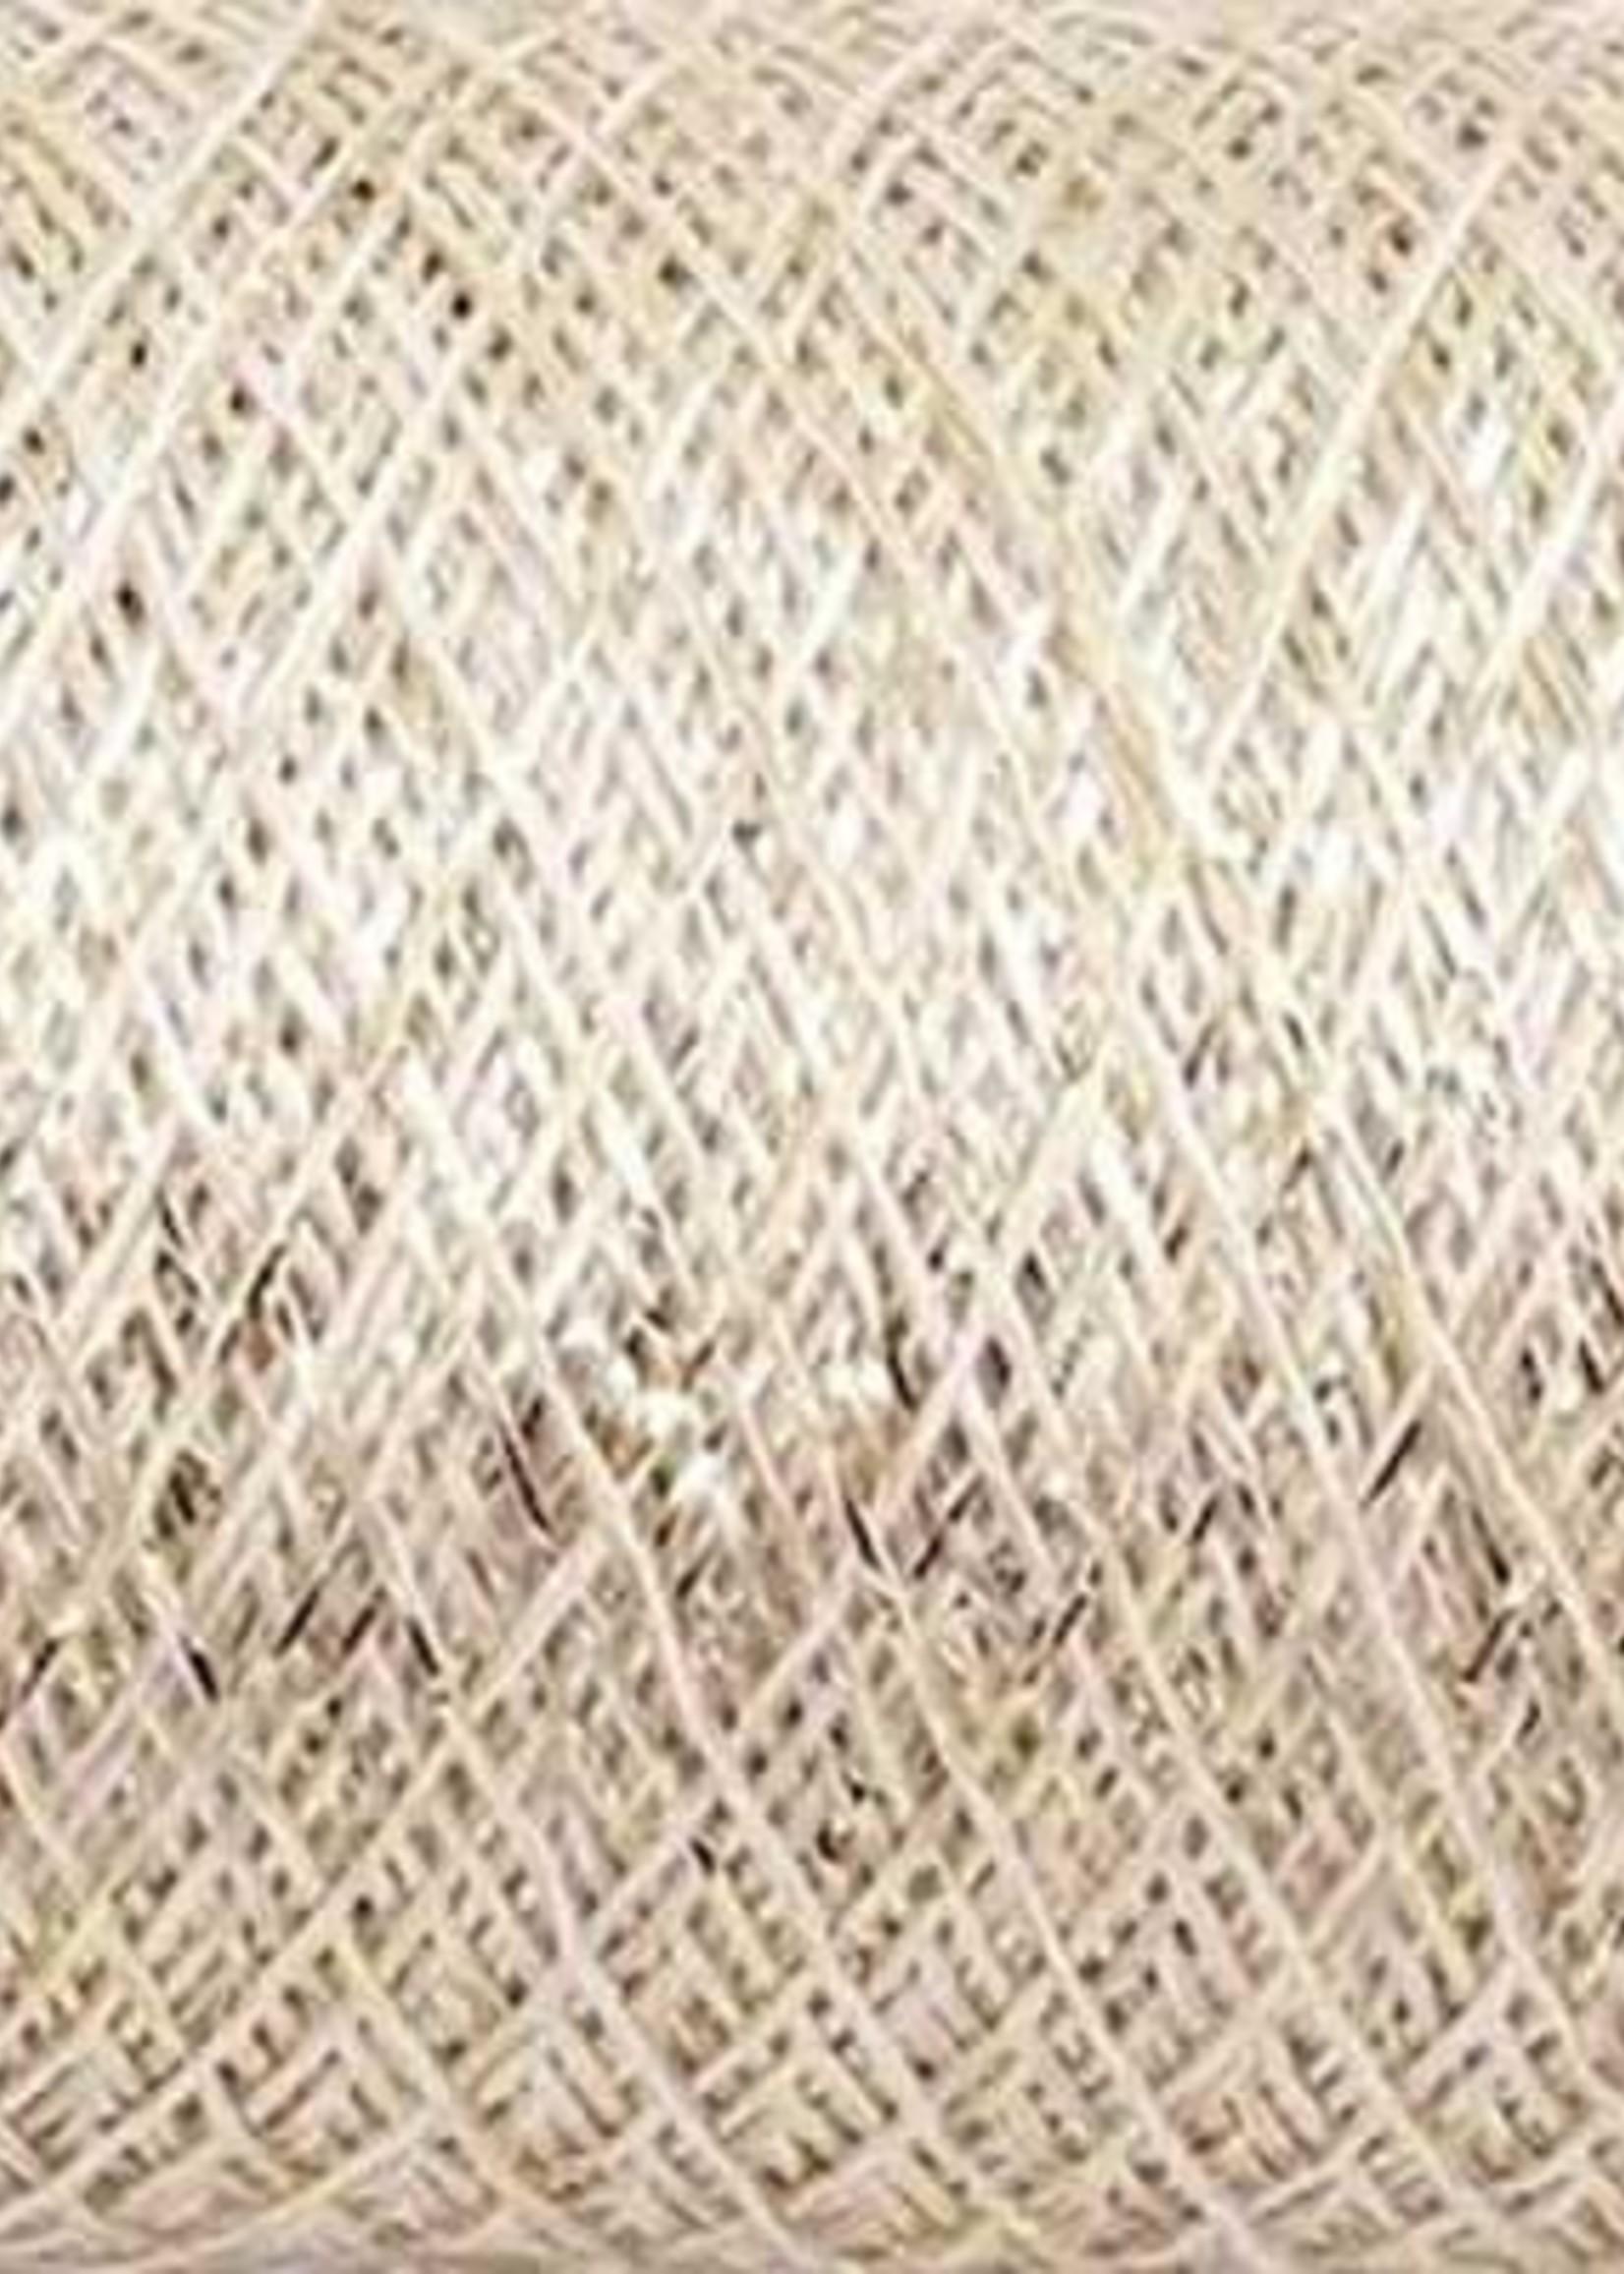 Kremke Soul Wool Kremke Stellaris Metallic Lace -183 Creme Gold